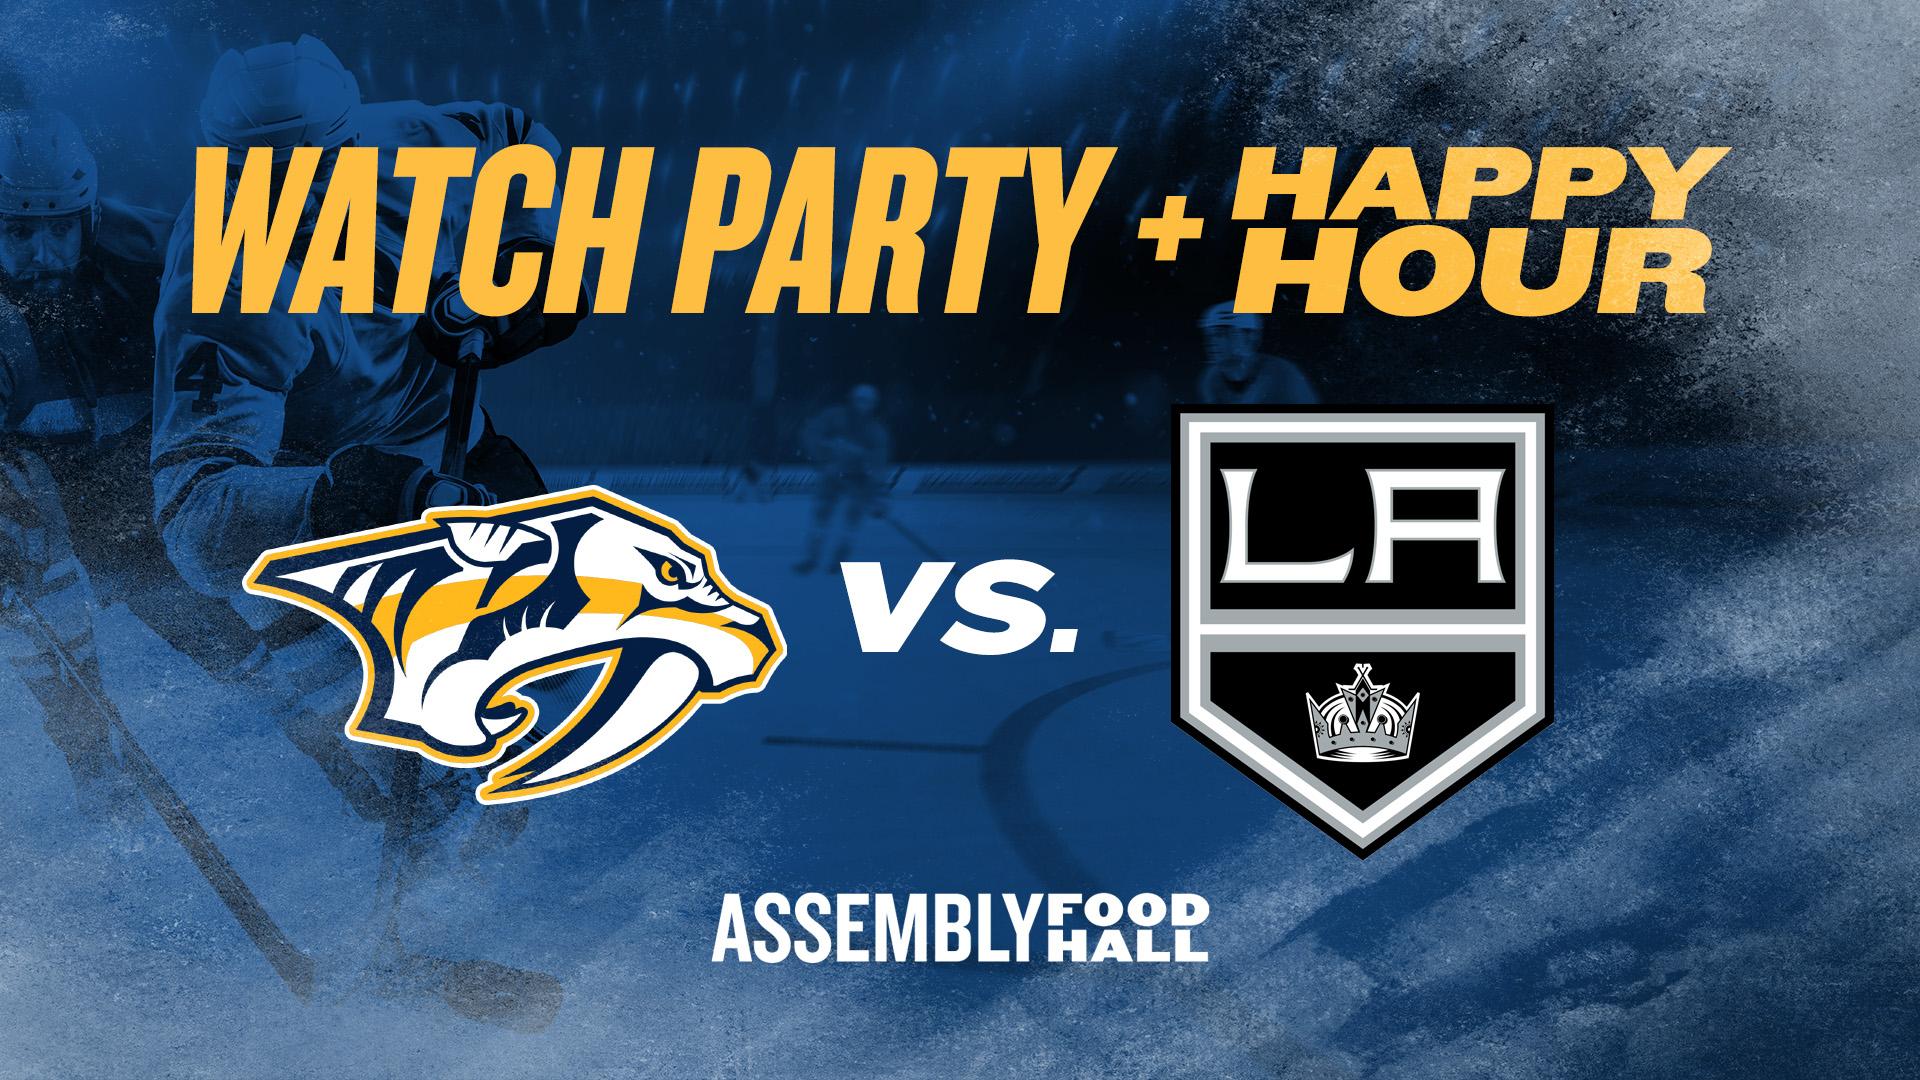 Predators vs. LA Kings I Watch Party & Happy Hour - hero